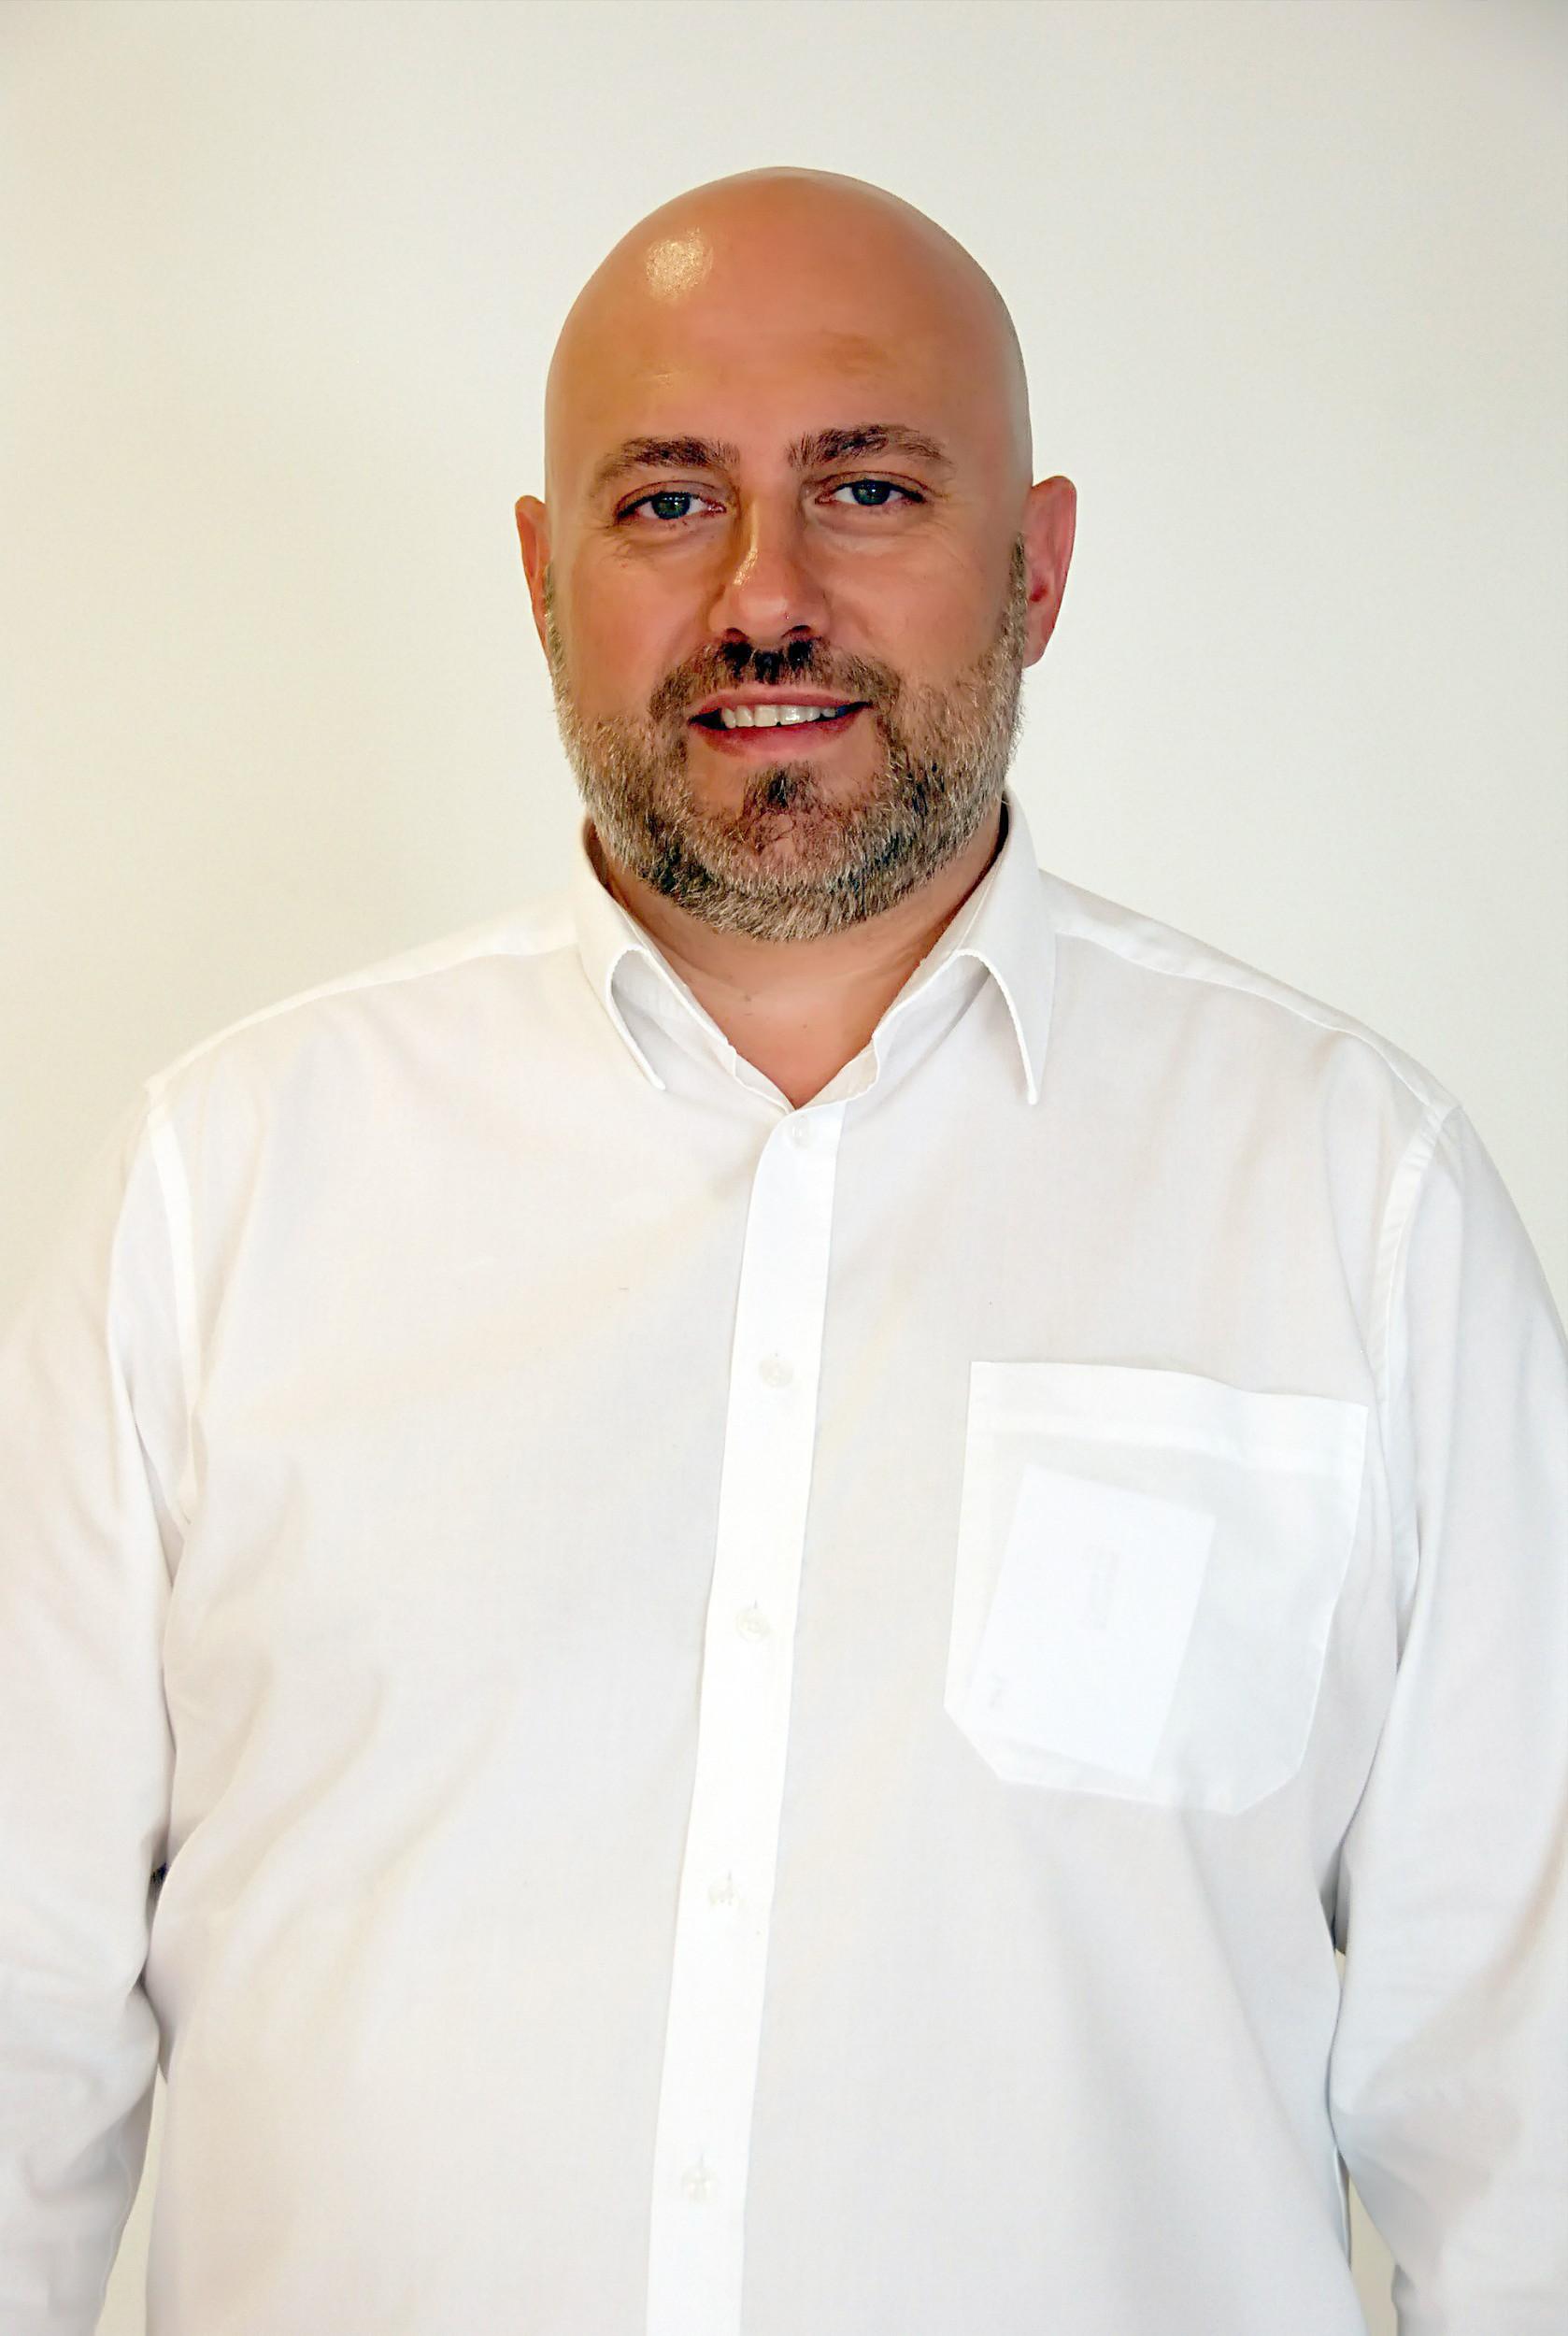 José Luis Arasti Pérez